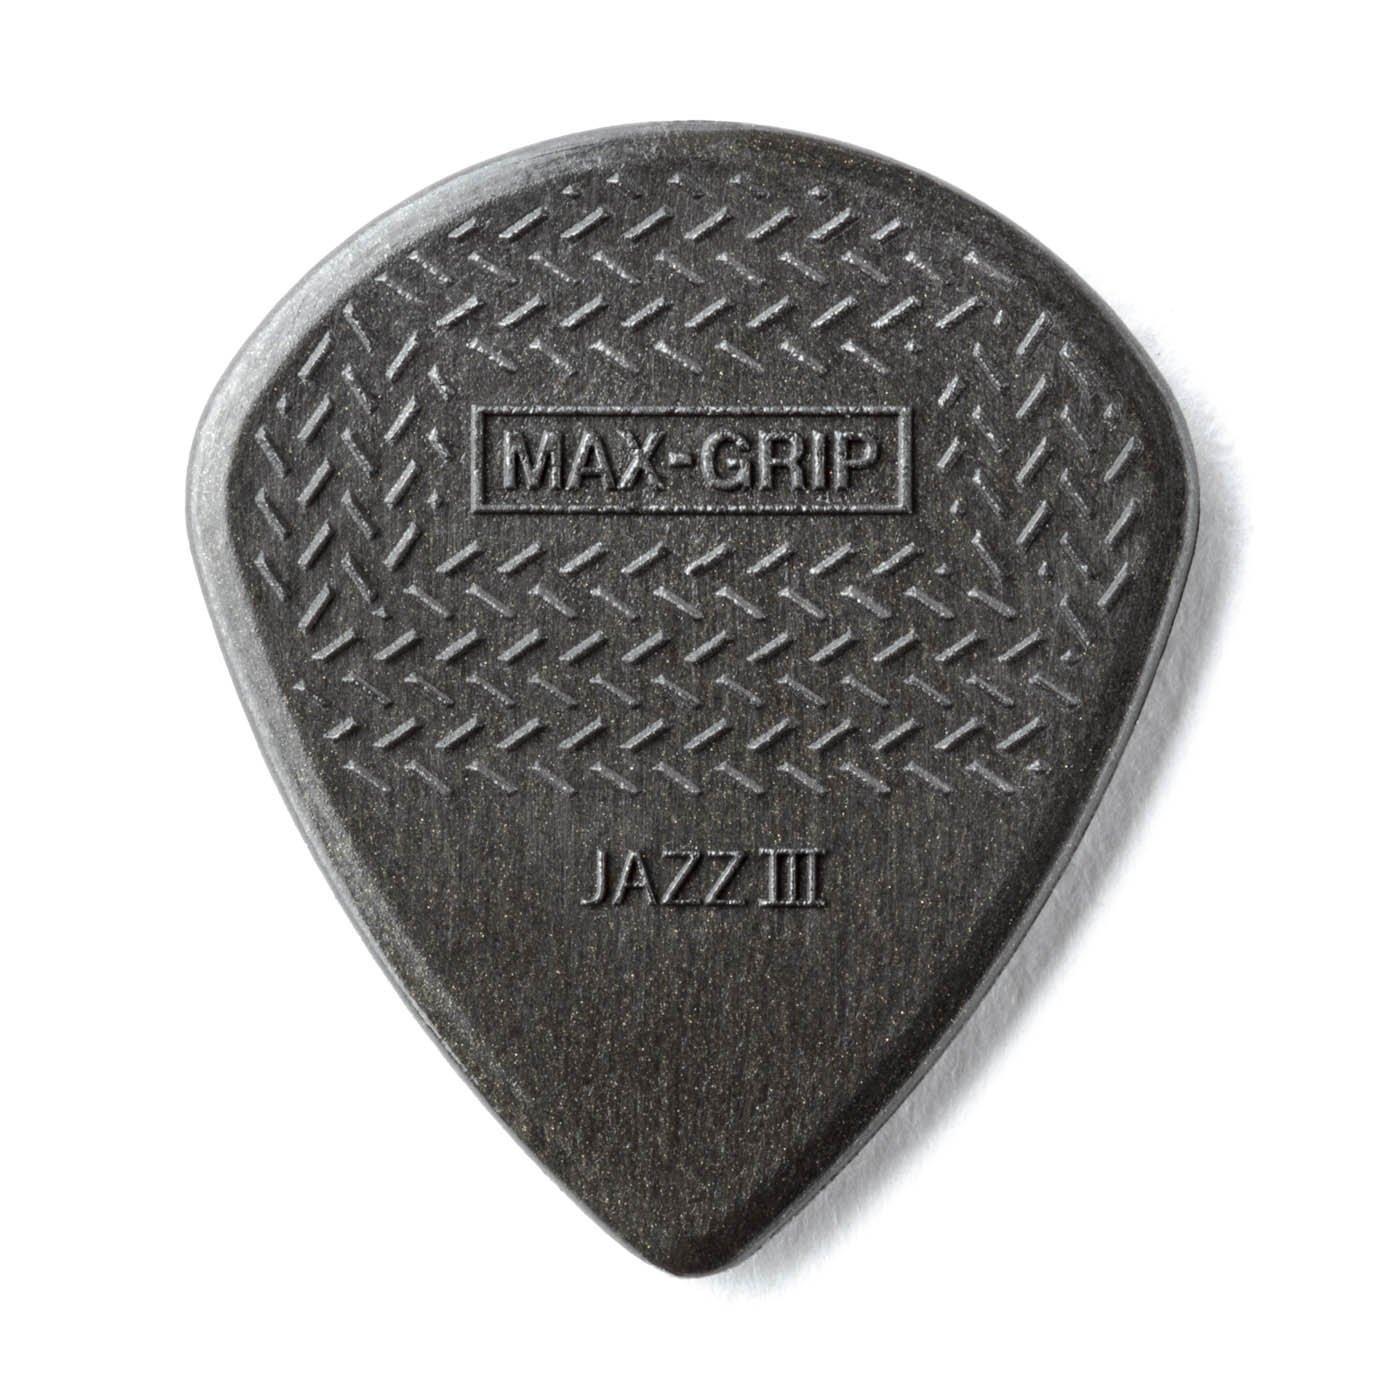 Dunlop Max Grip Jazz III Guitar Picks 6 PK